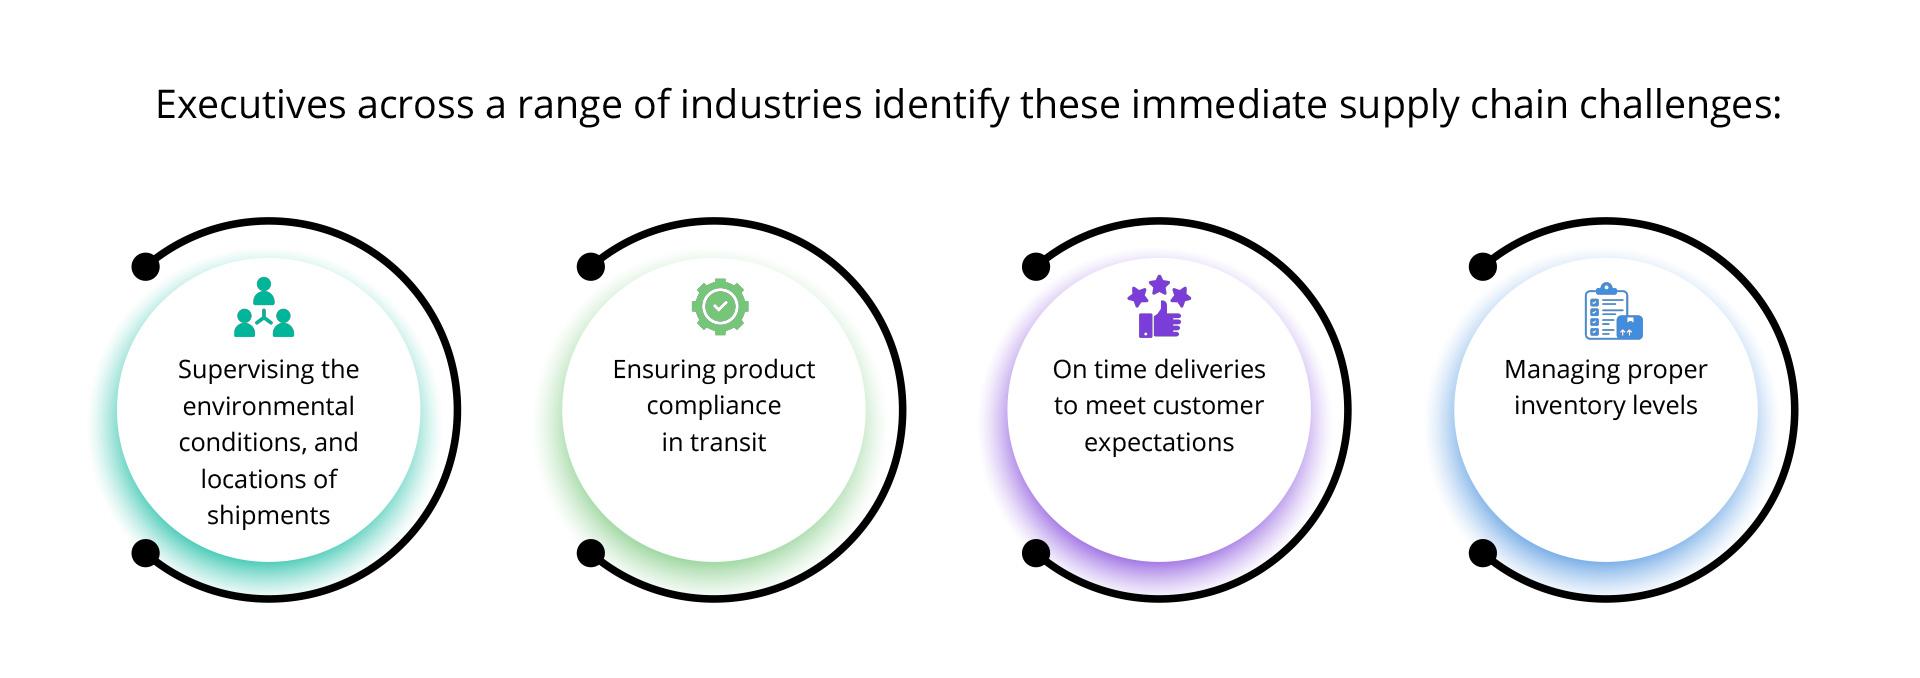 range of industries identify